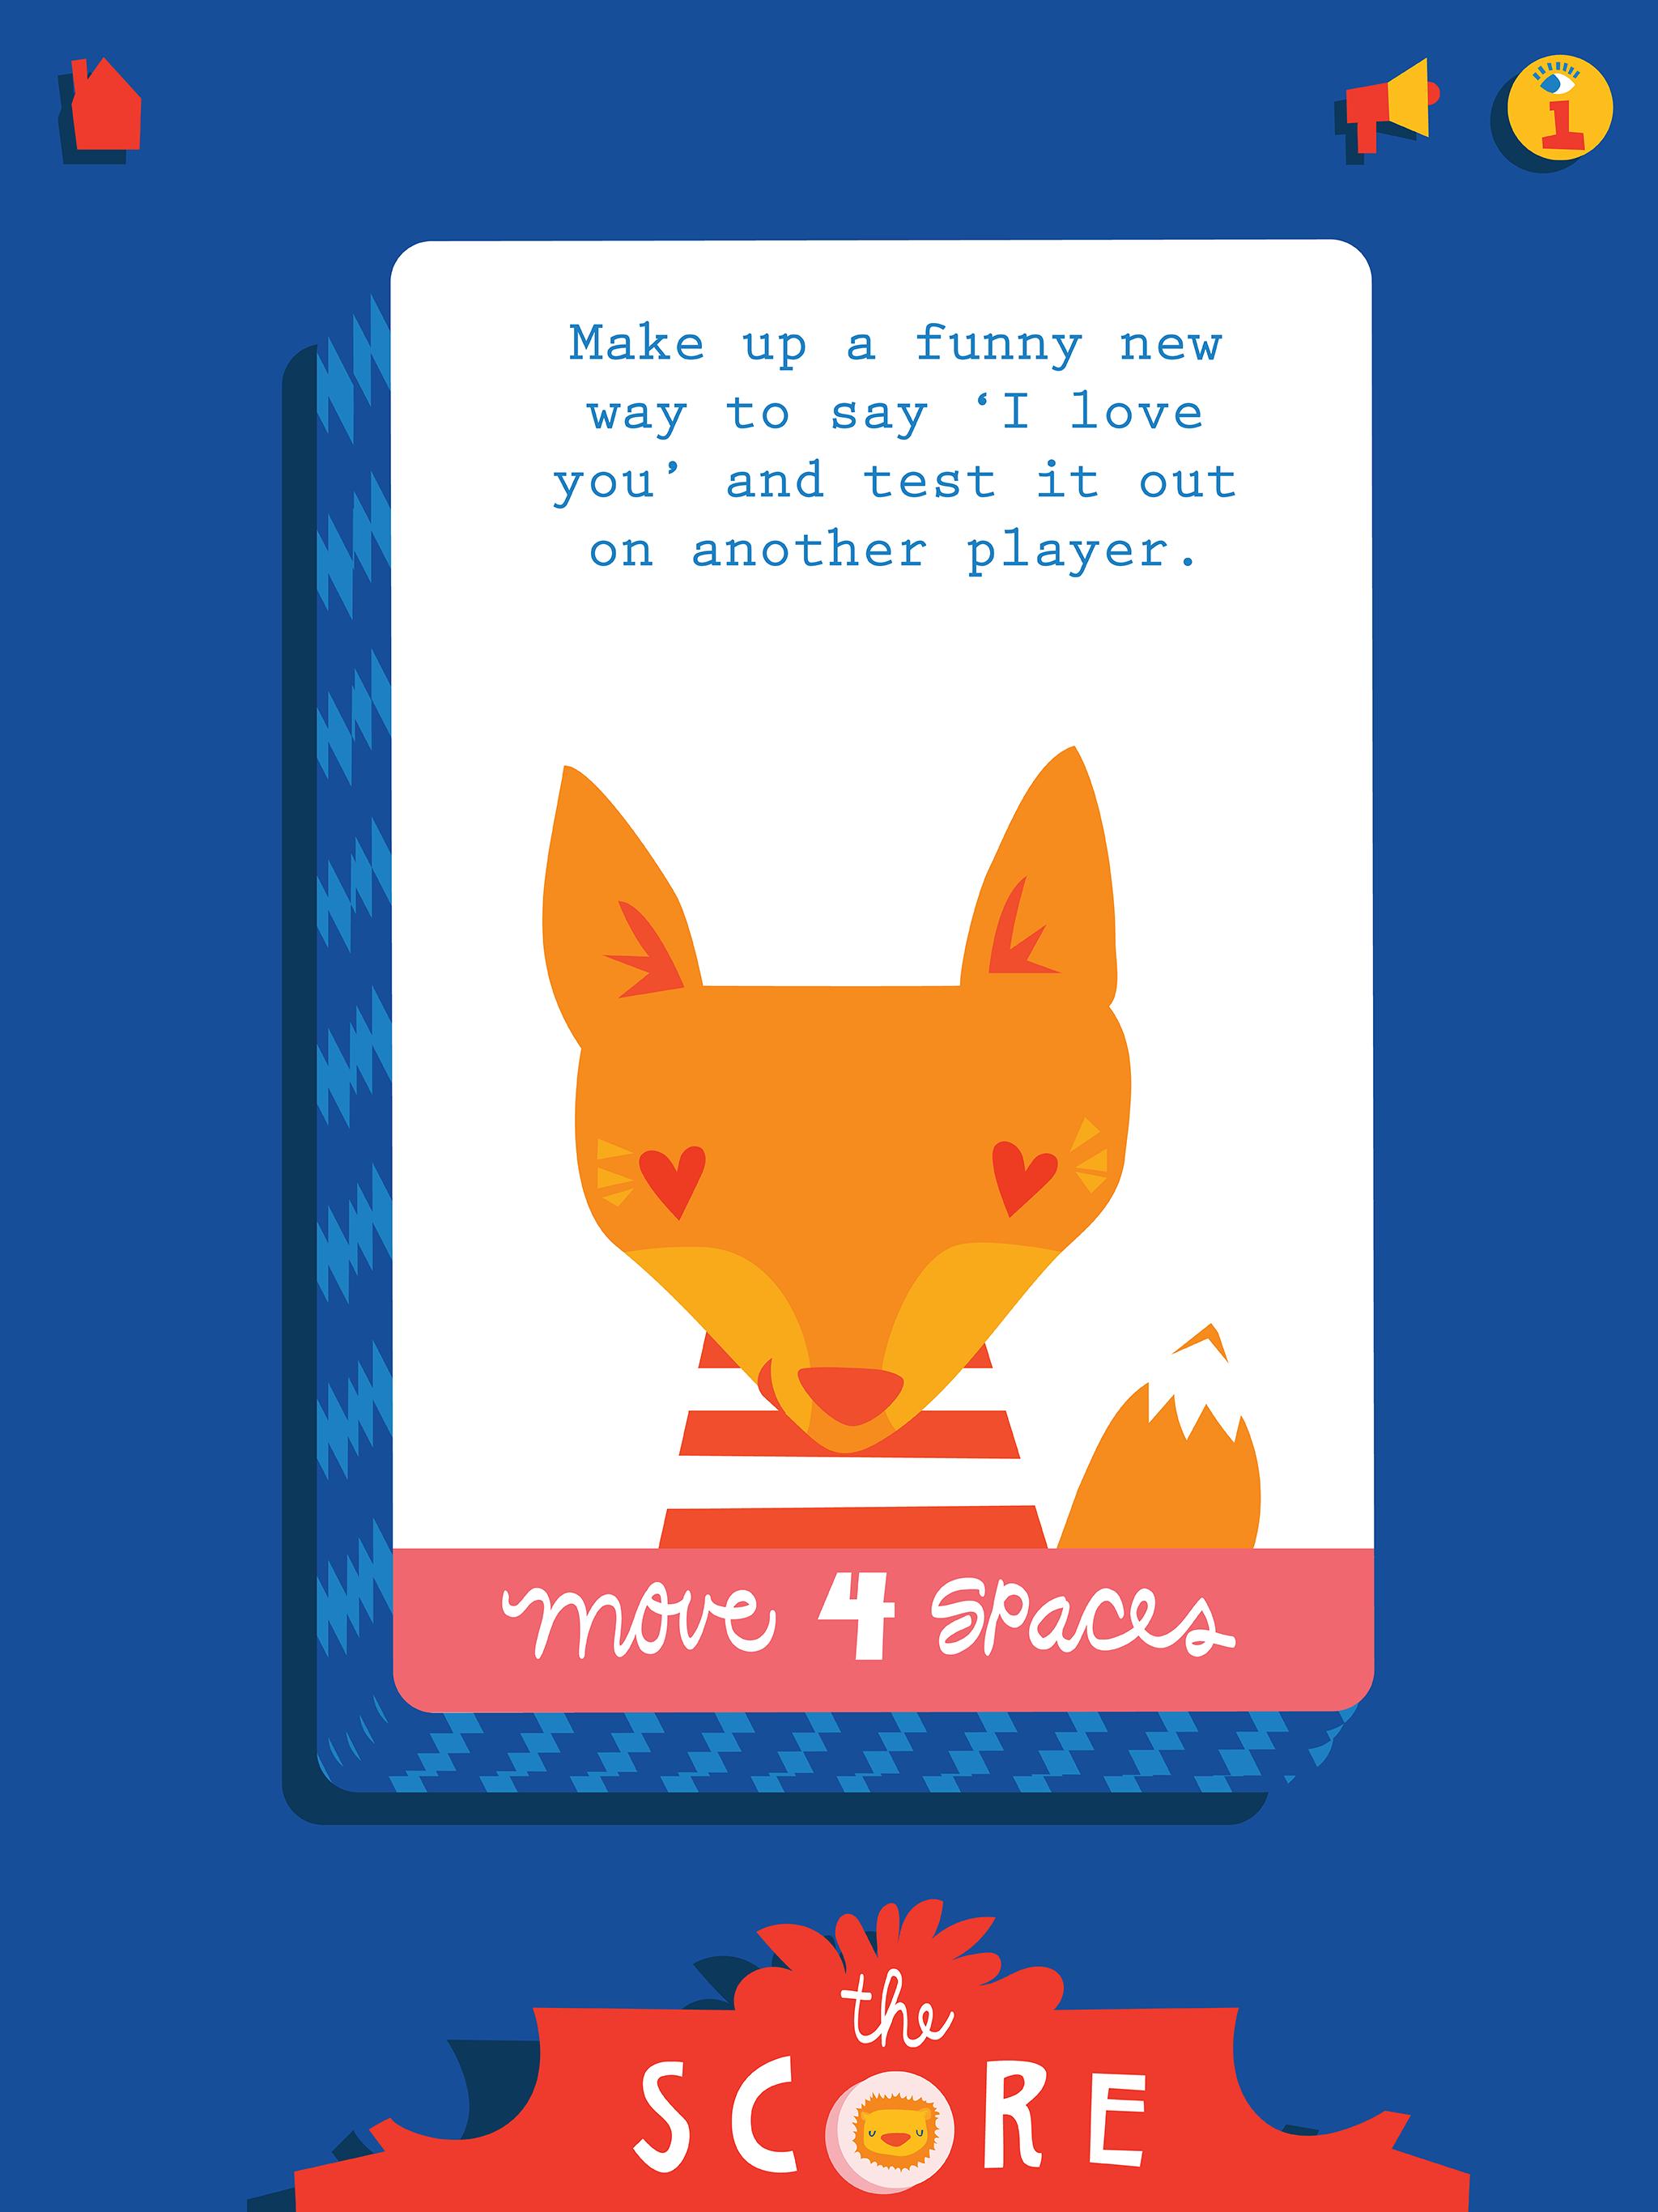 silly_street_learn_play_steam_app_socialemotional